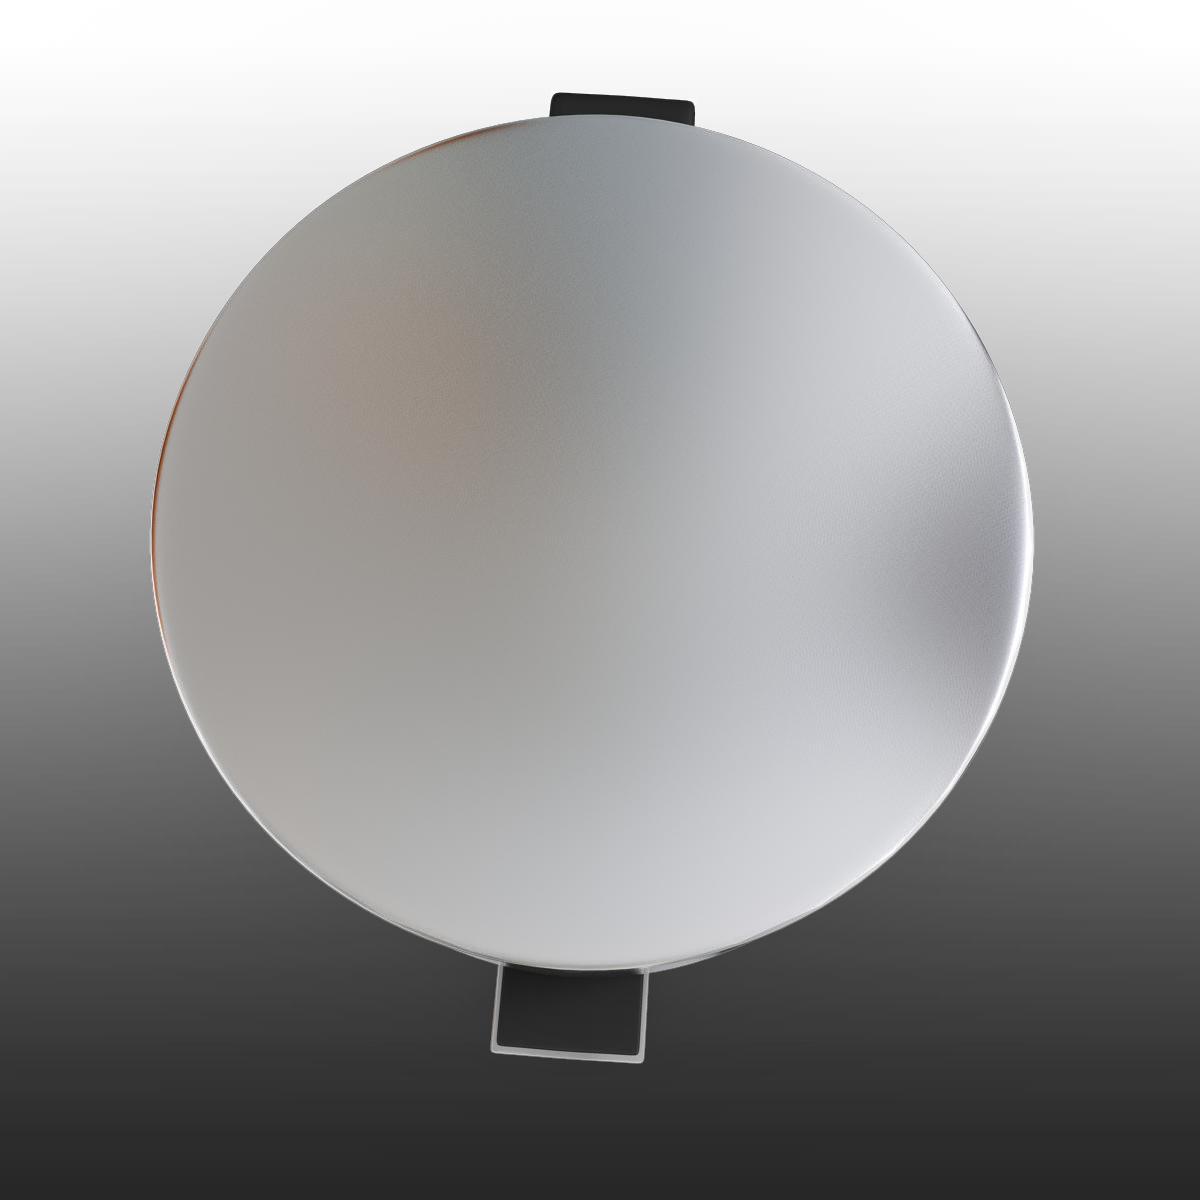 bathroom dumpster 3d model 3ds max fbx ma mb obj 155981